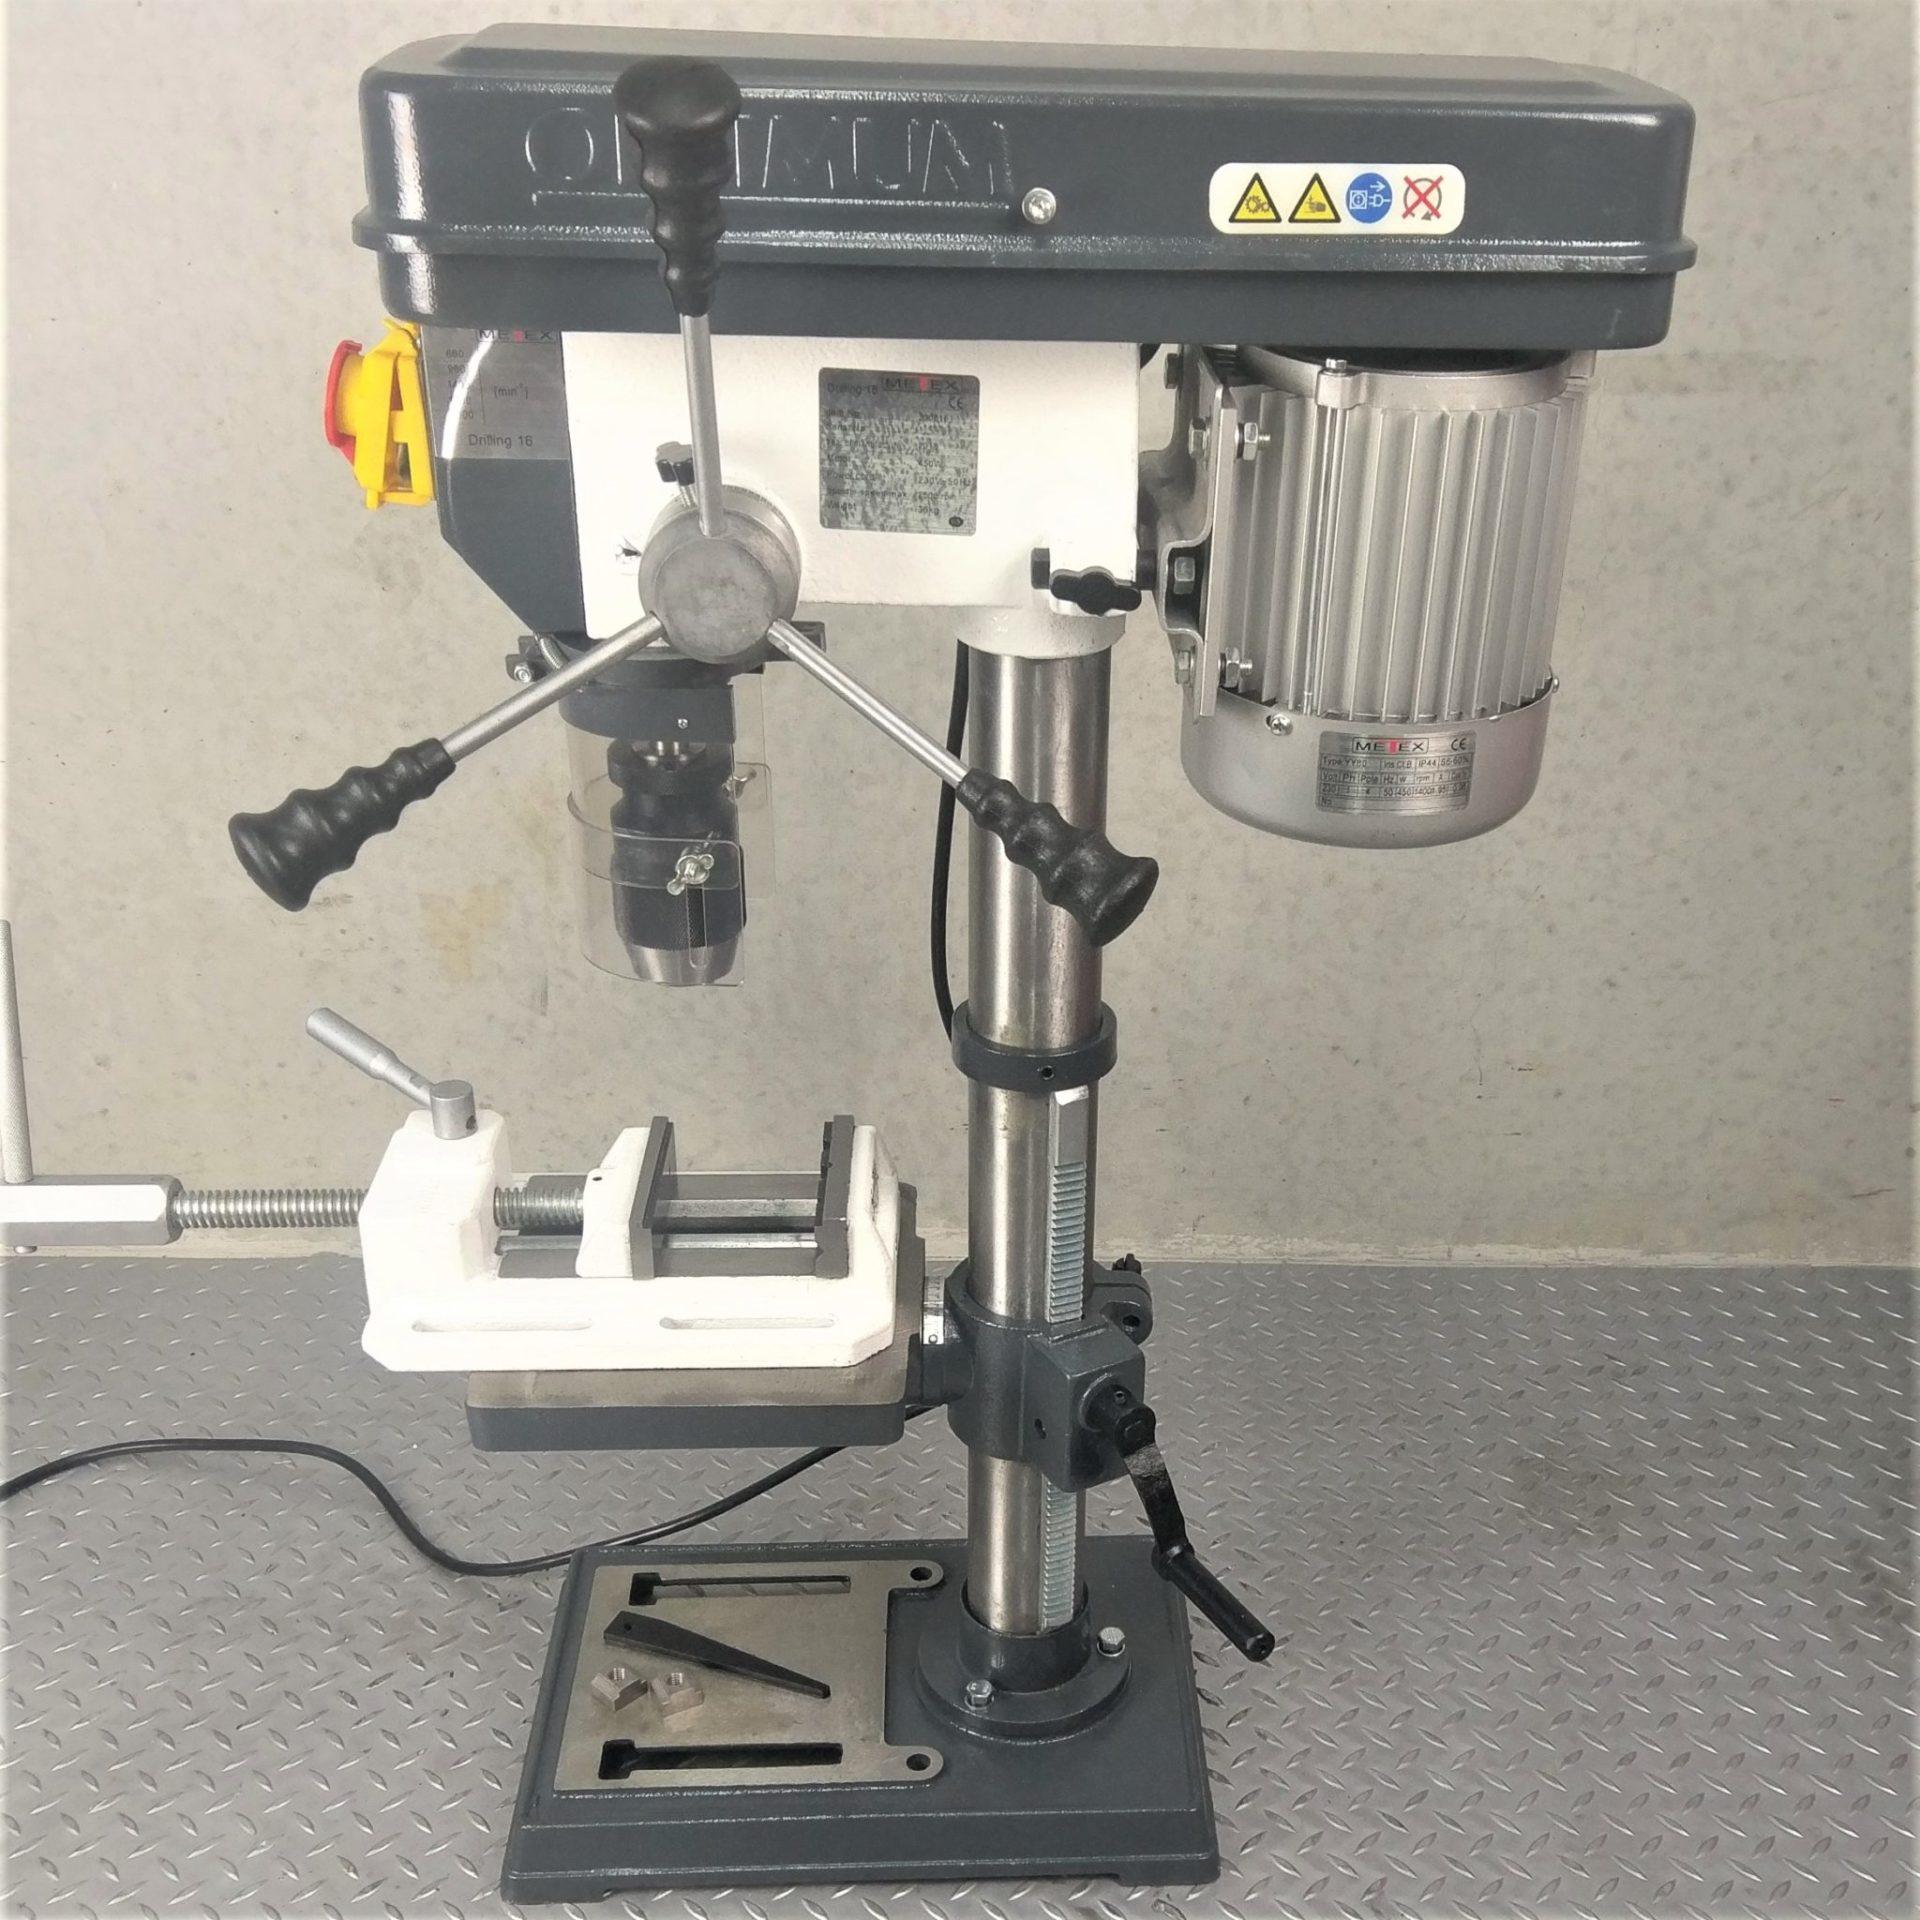 Bench Drill Press 16mm Metex By Optimum Quality Free